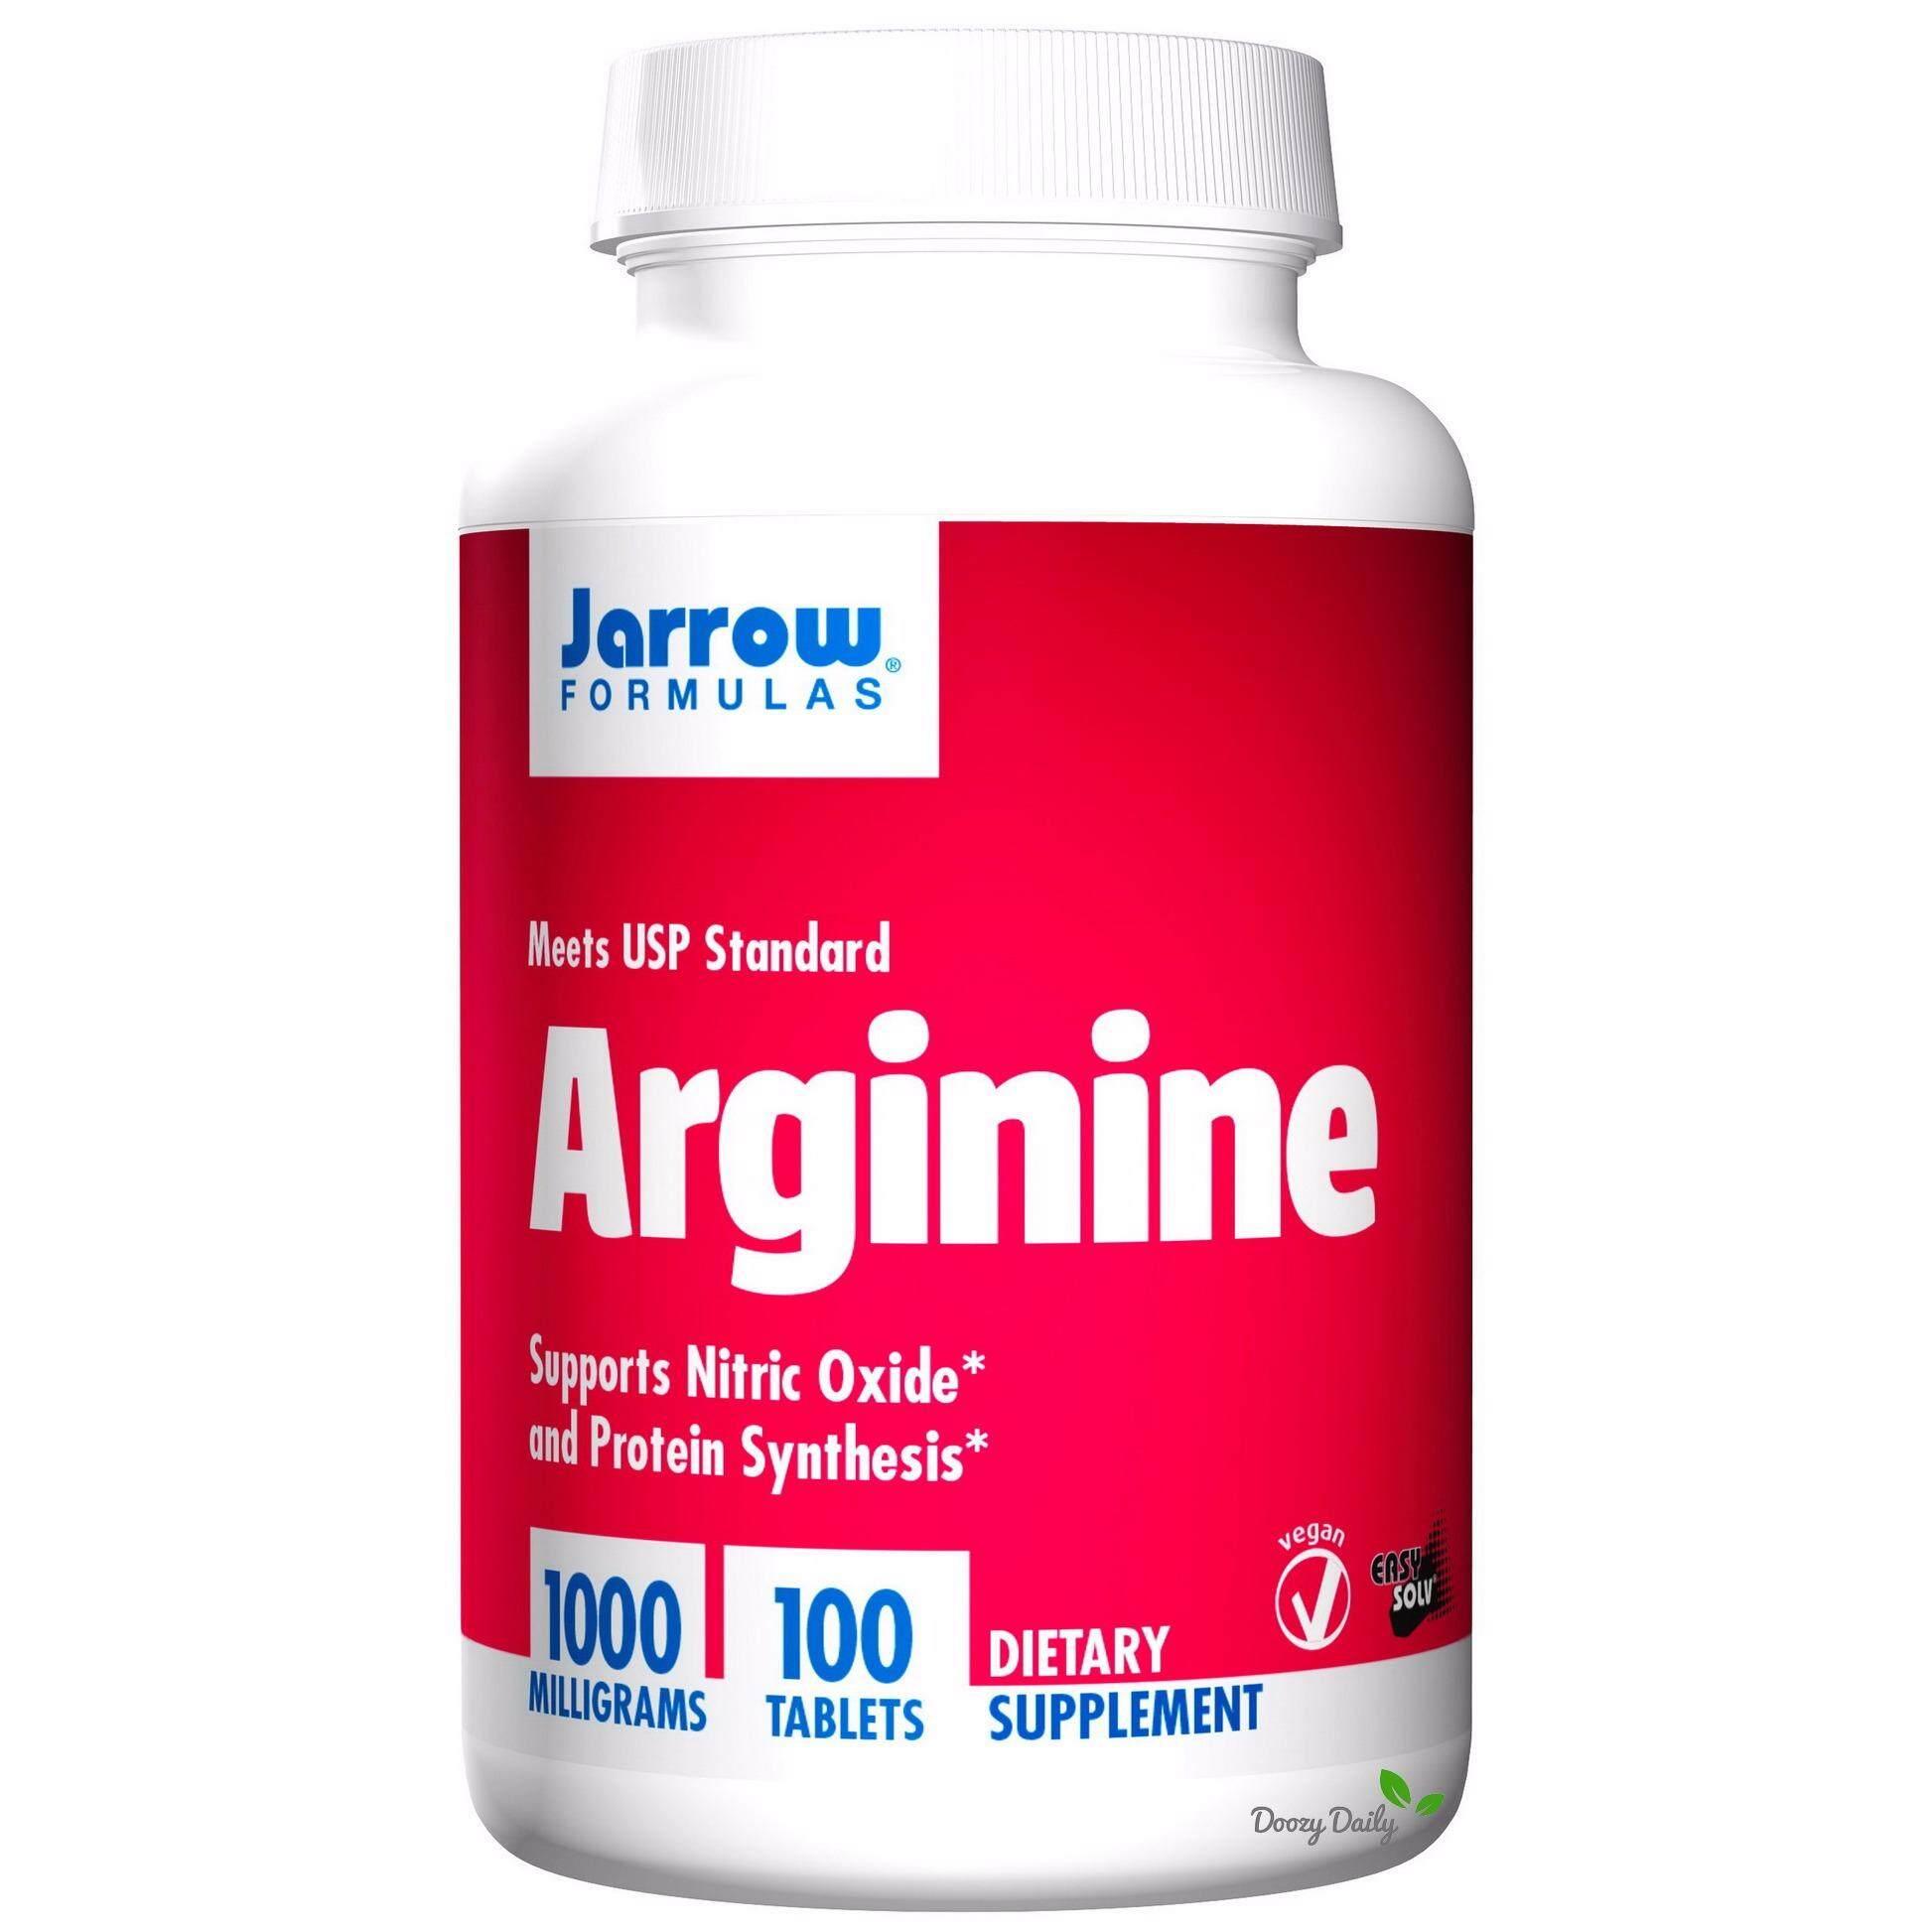 Jarrow Formulas L-Arginine 1000 mg x 100 เม็ด อาร์จีนีน กรดอะมิโนจำเป็น Essential Arginine